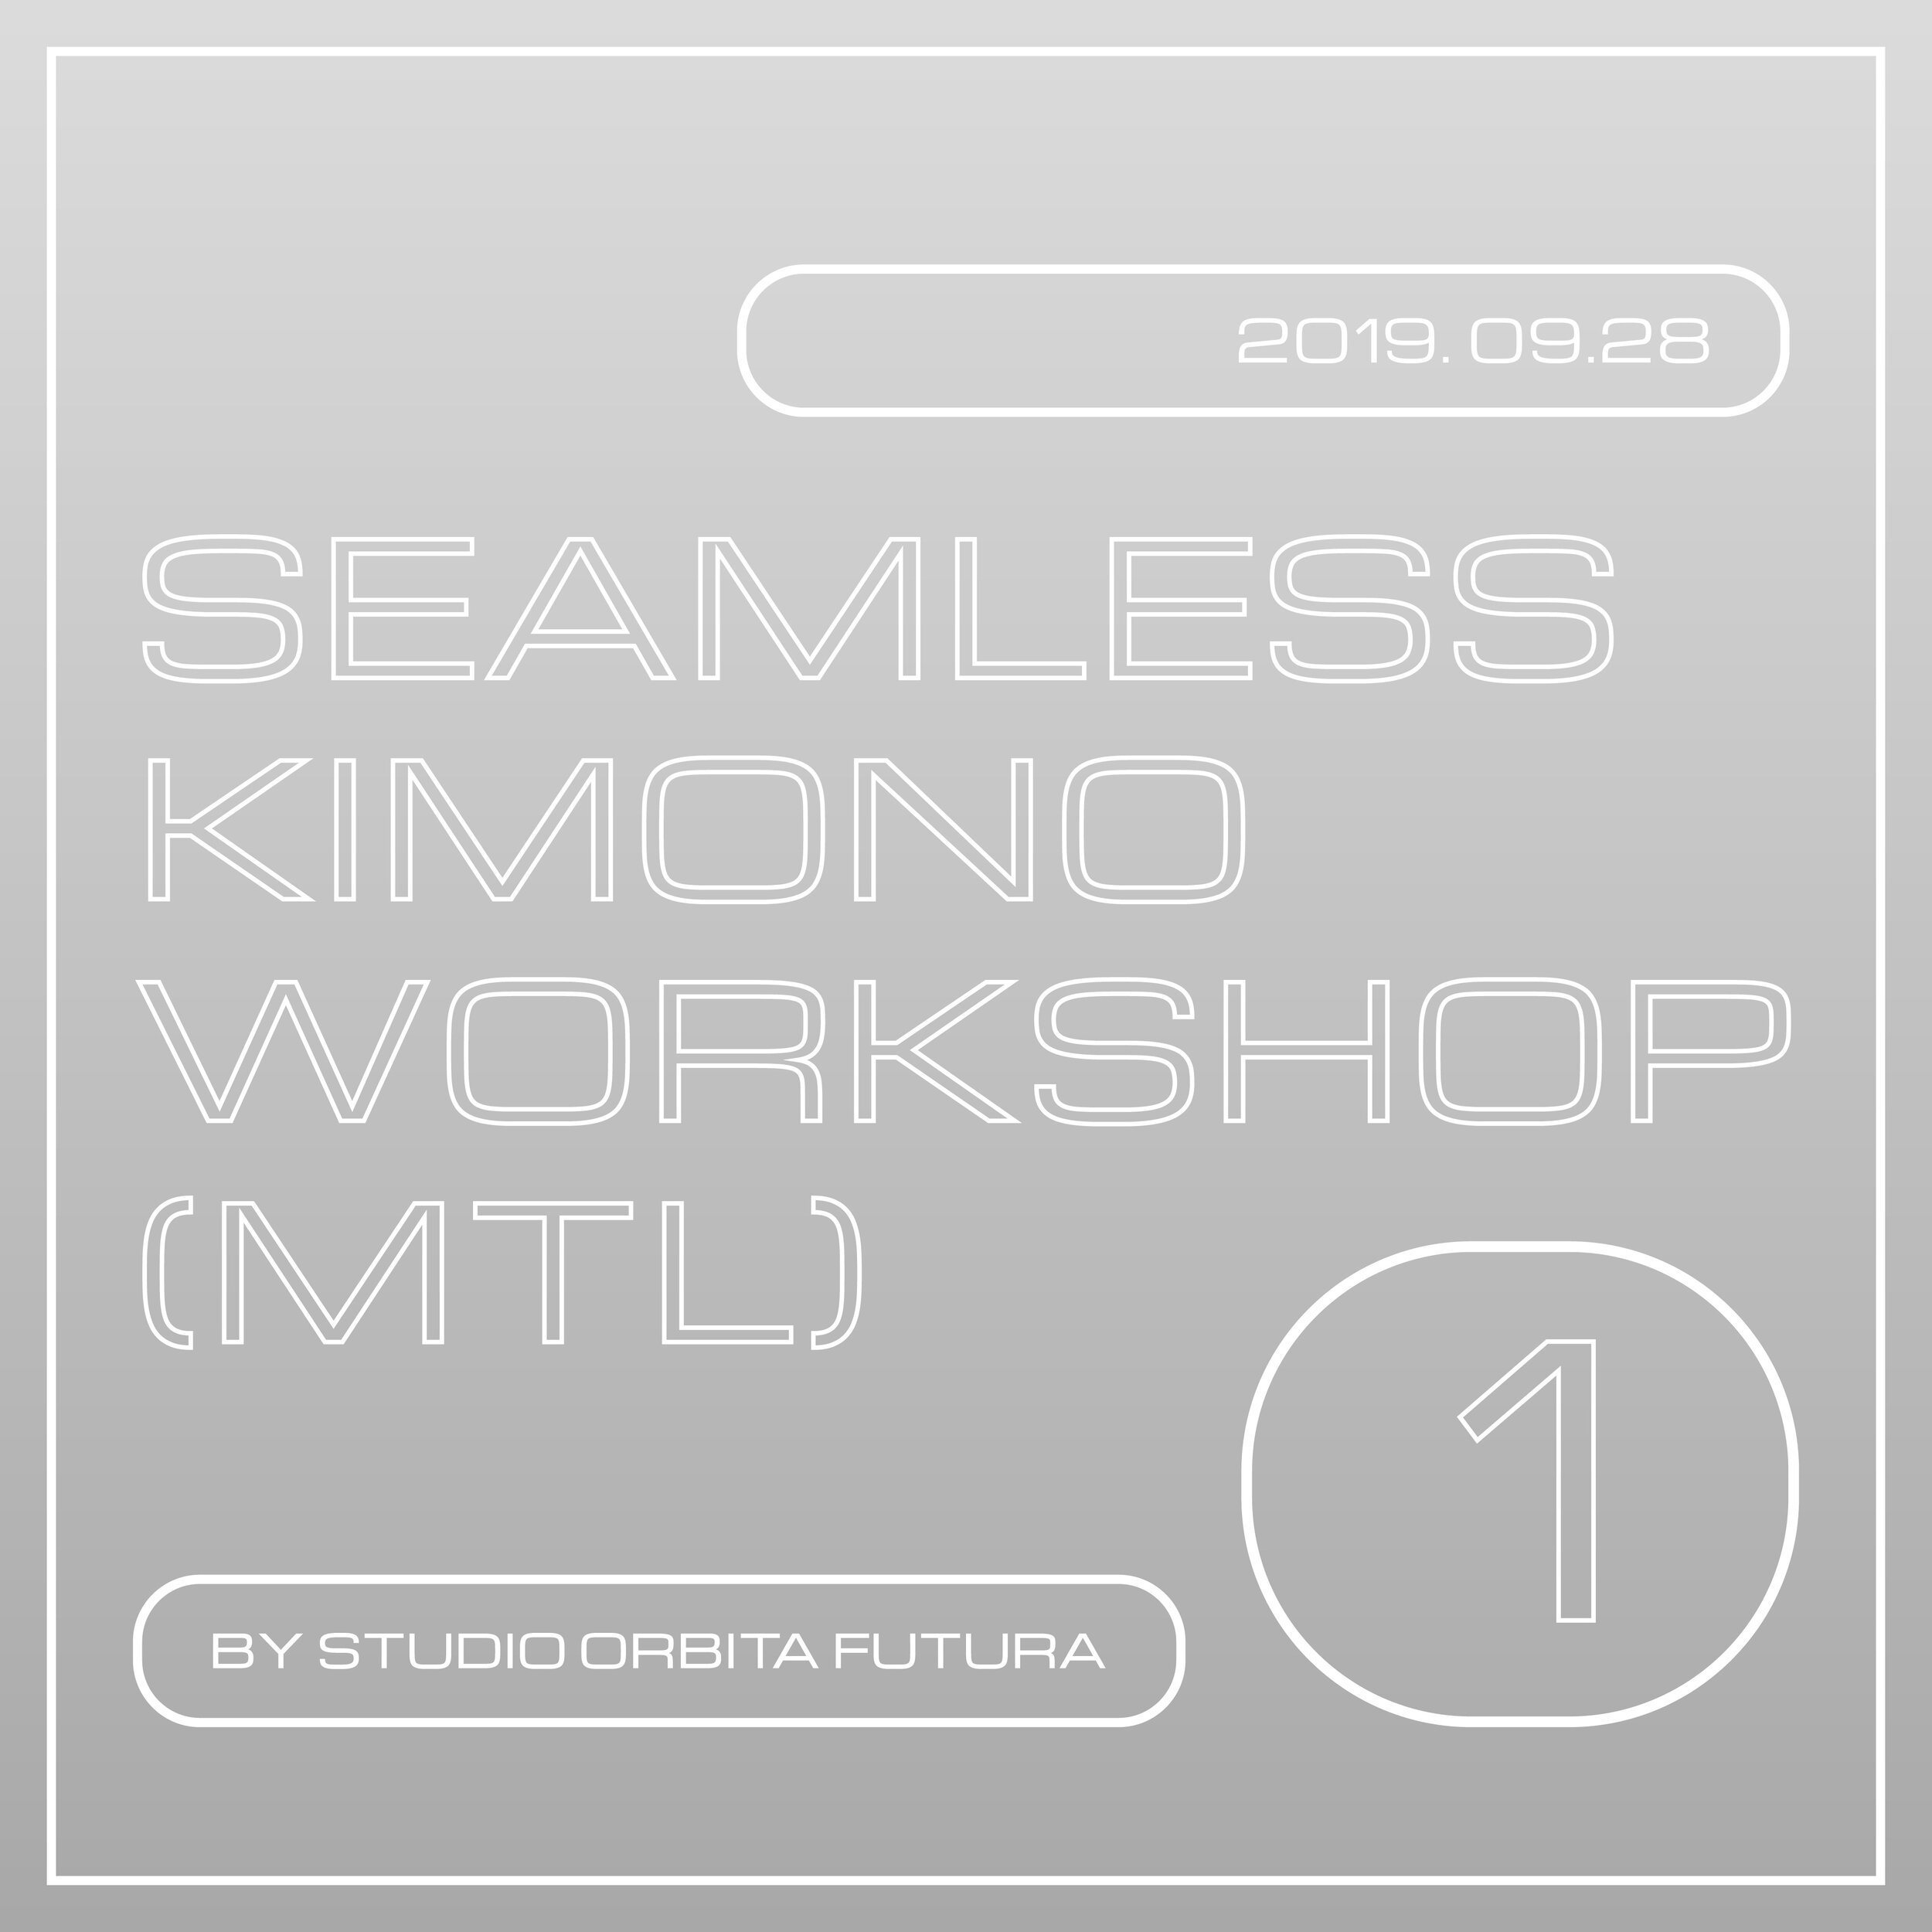 workshop_seamless-kimono_release_01_1000px.jpg